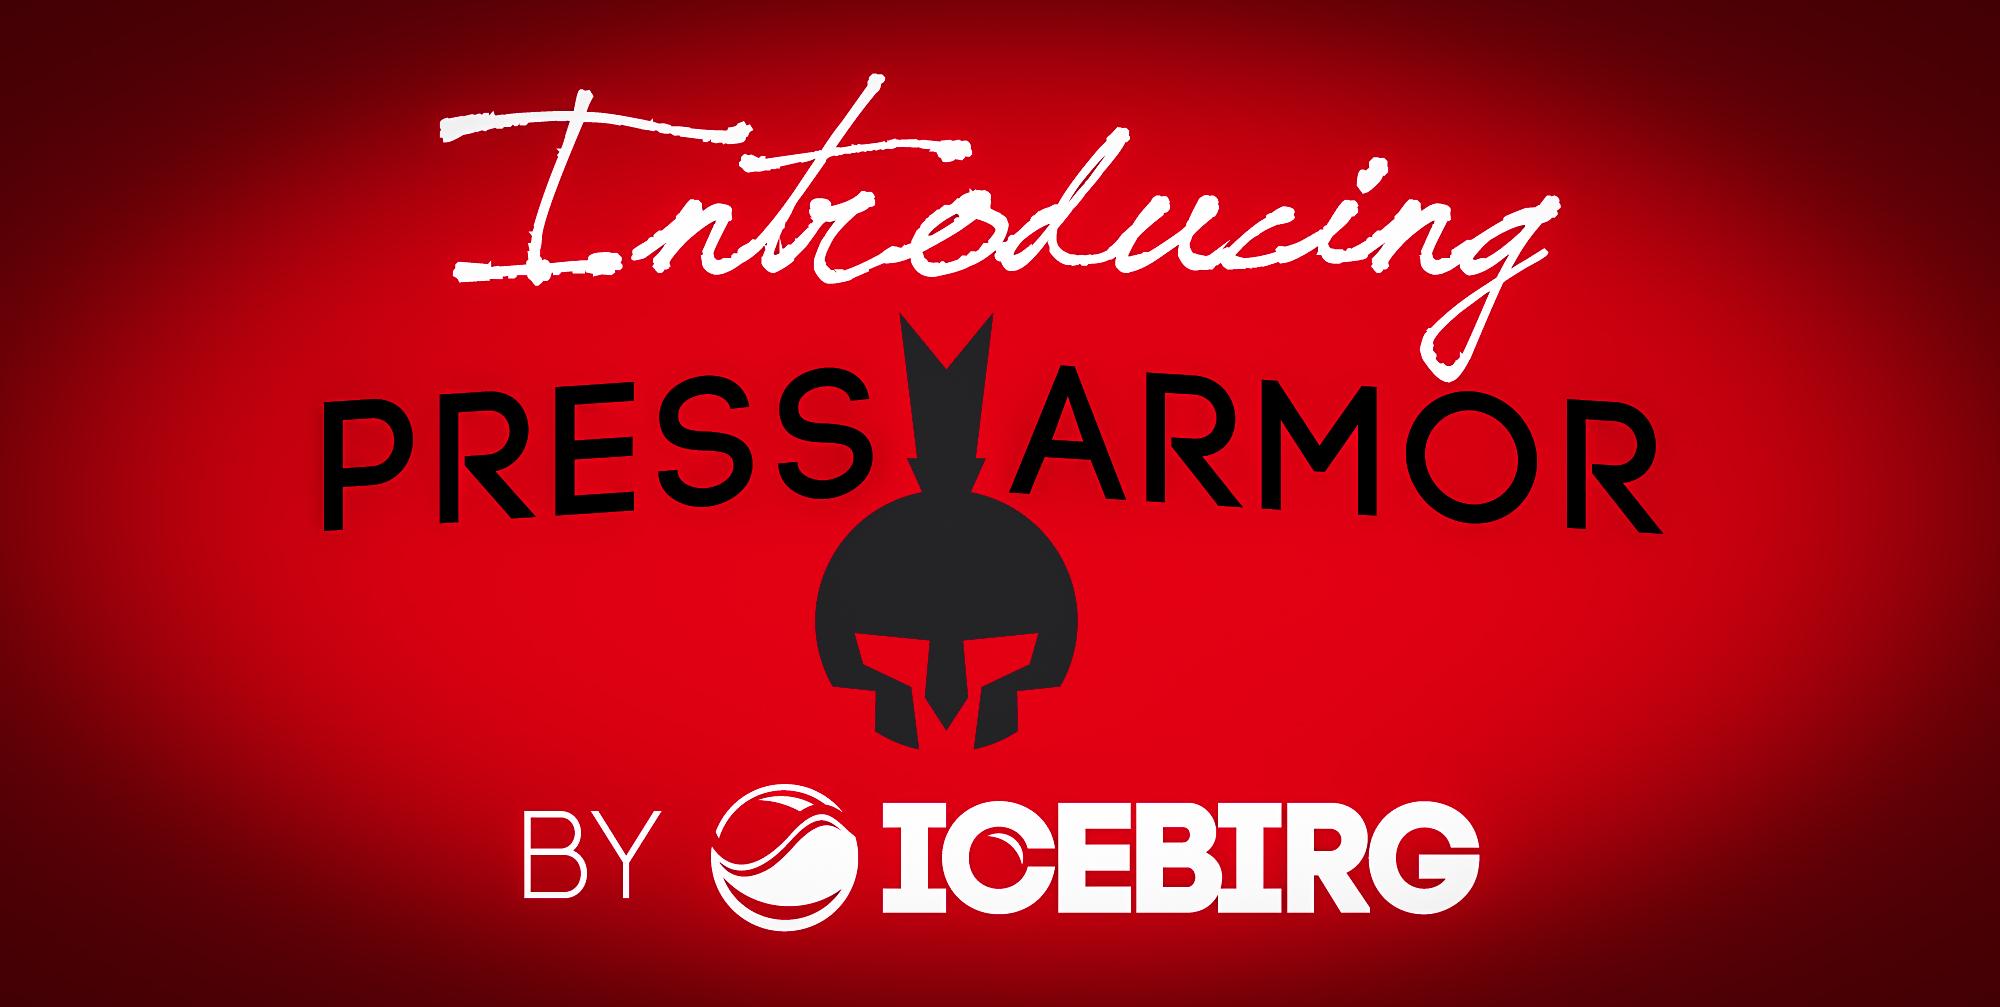 intro-to-press-armor final.jpg